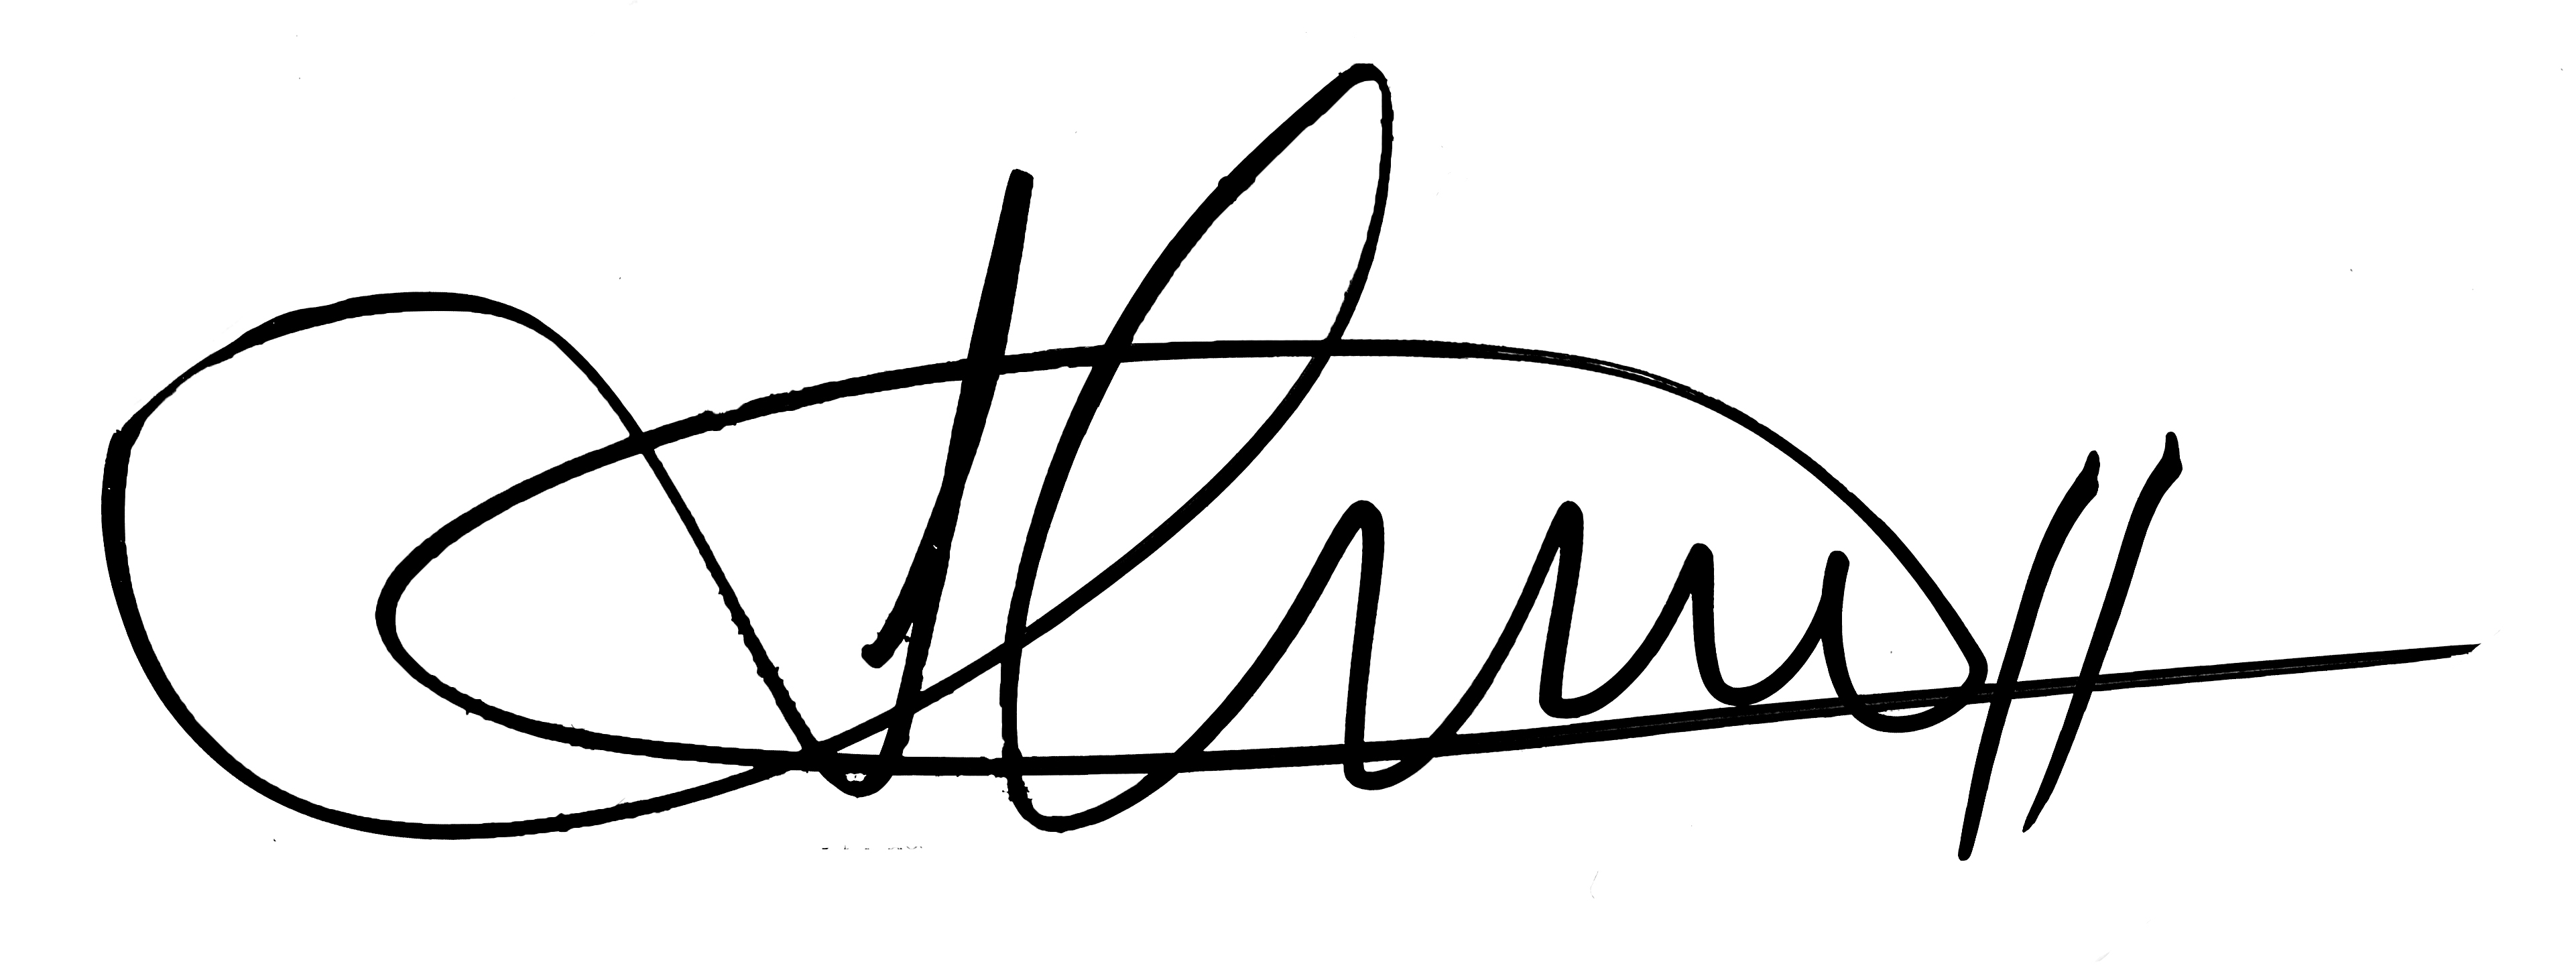 filealice sara ott signaturejpg